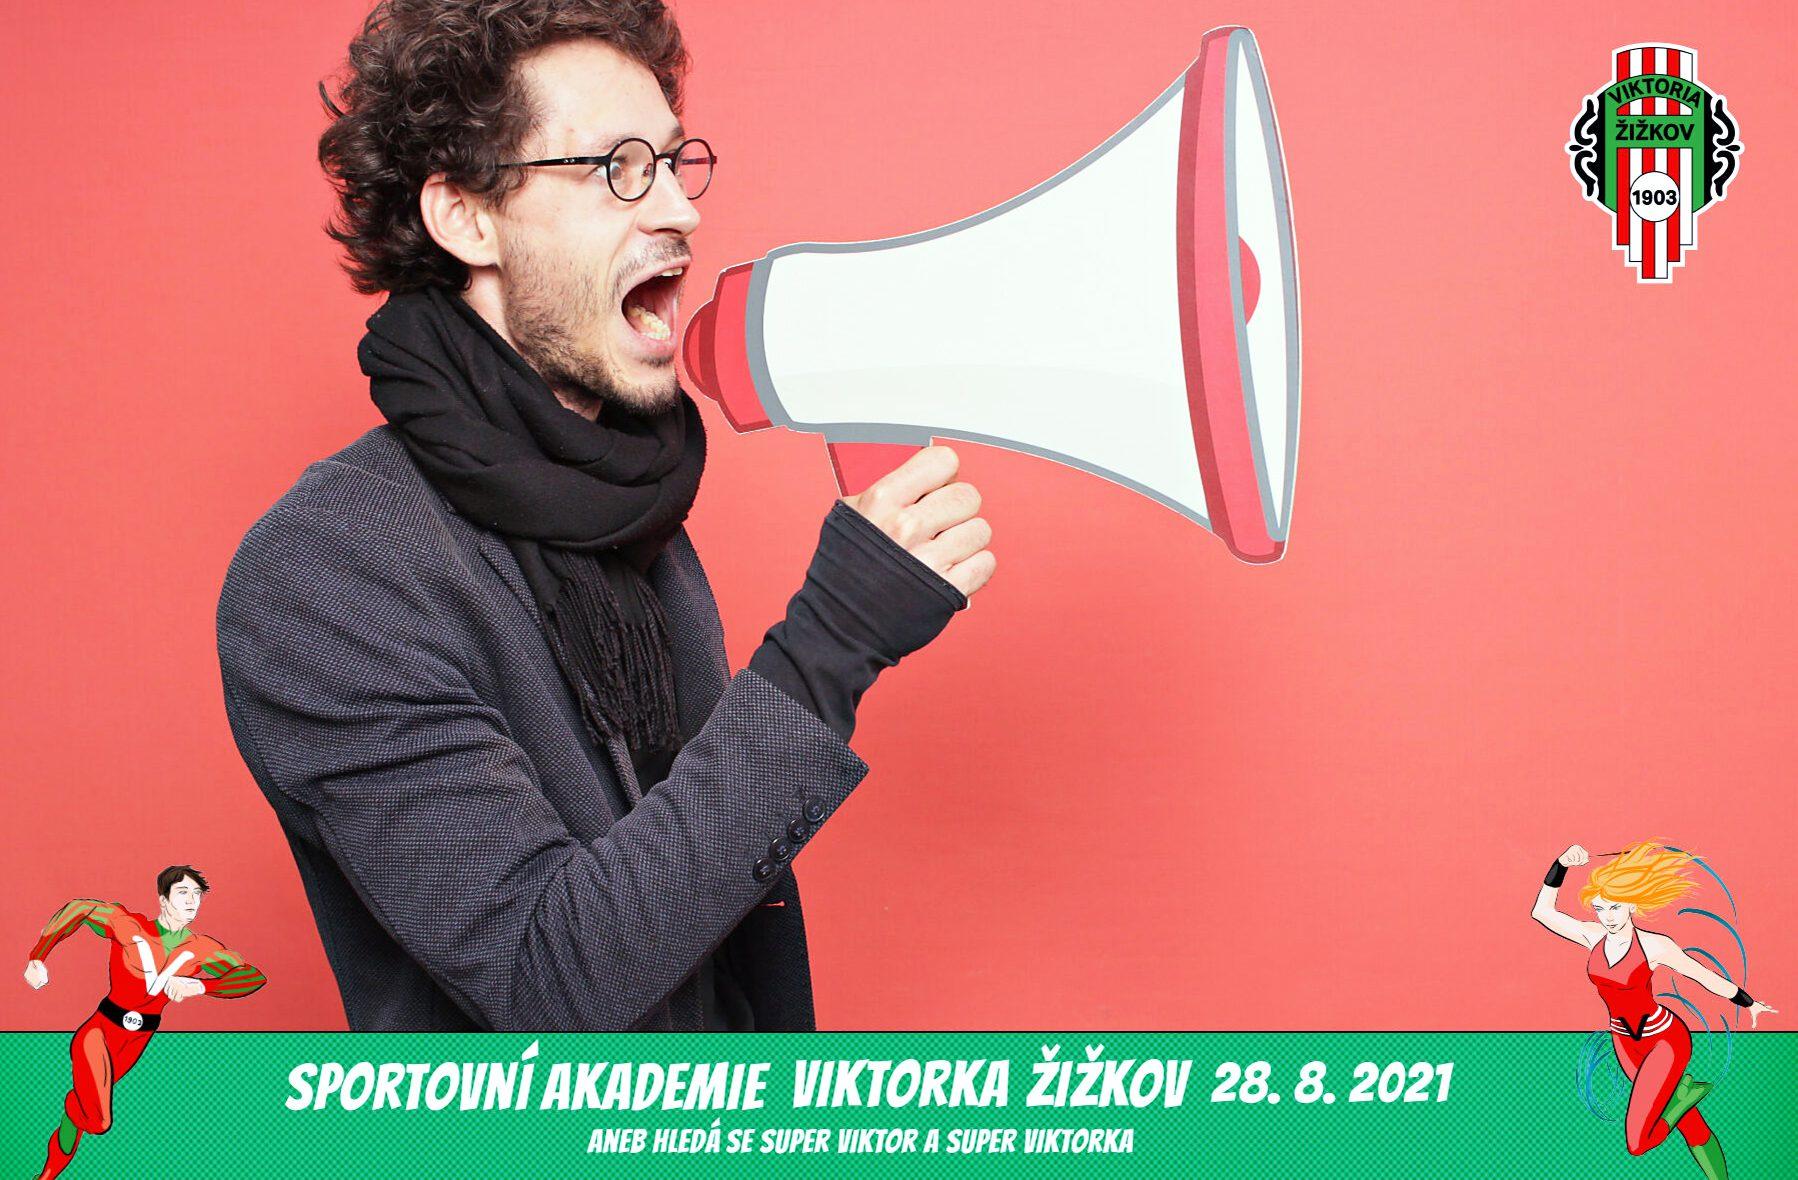 fotokoutek-family-day-praha-viktoria-zizkov-28-8-2021-743186